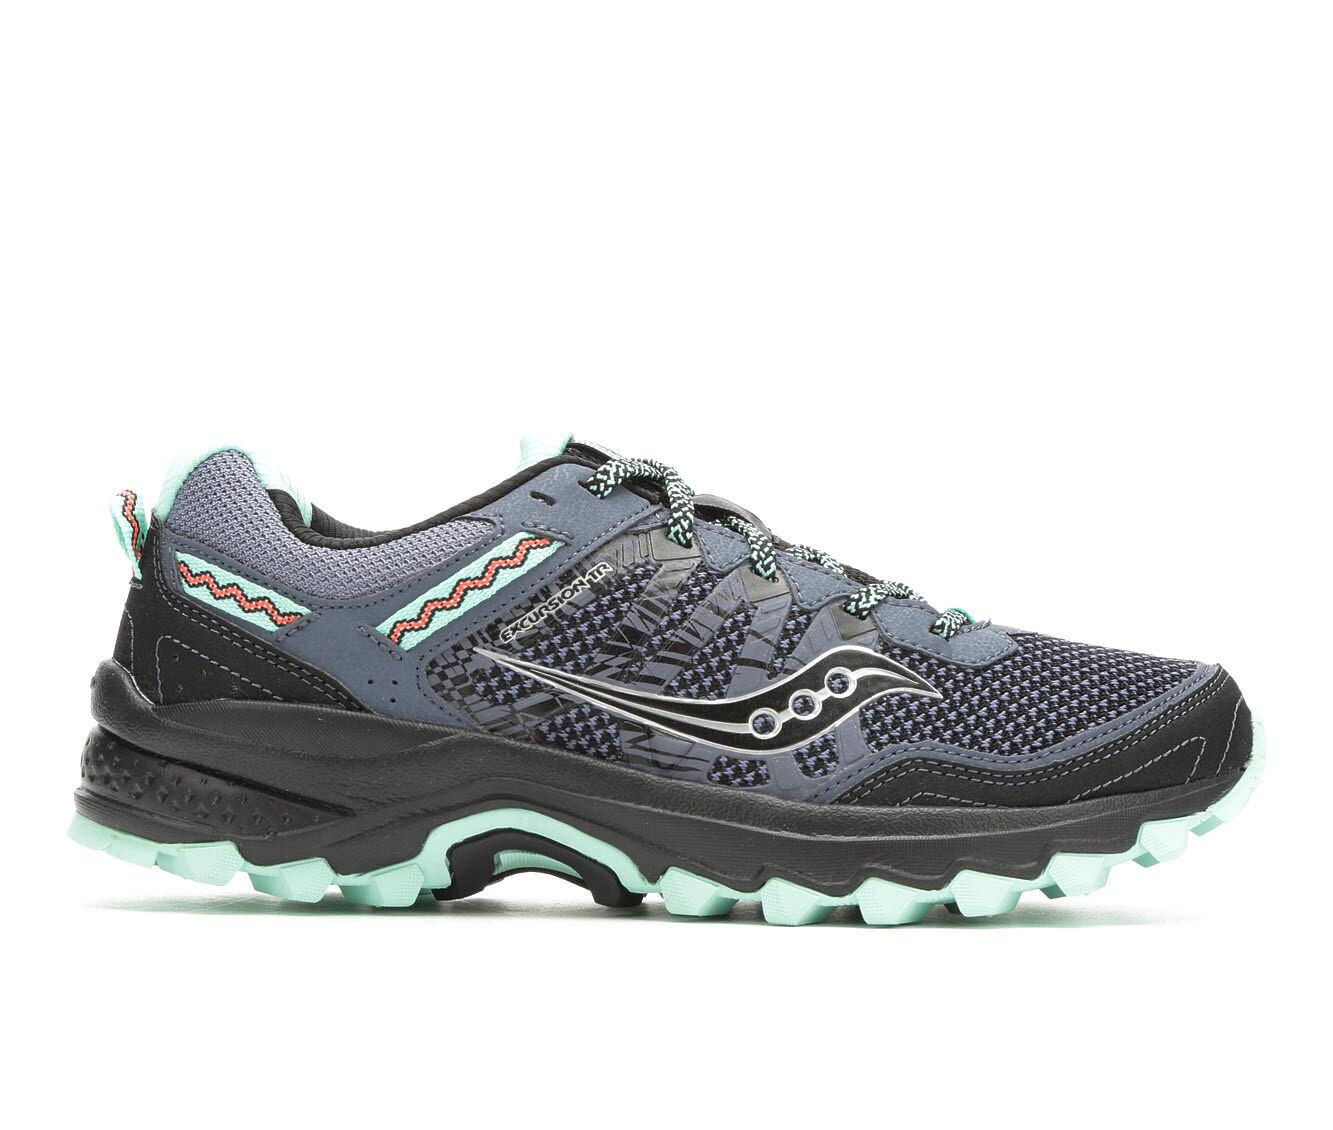 Women's Saucony Excursion TR 12 Trail Running Shoes Black/Aqua